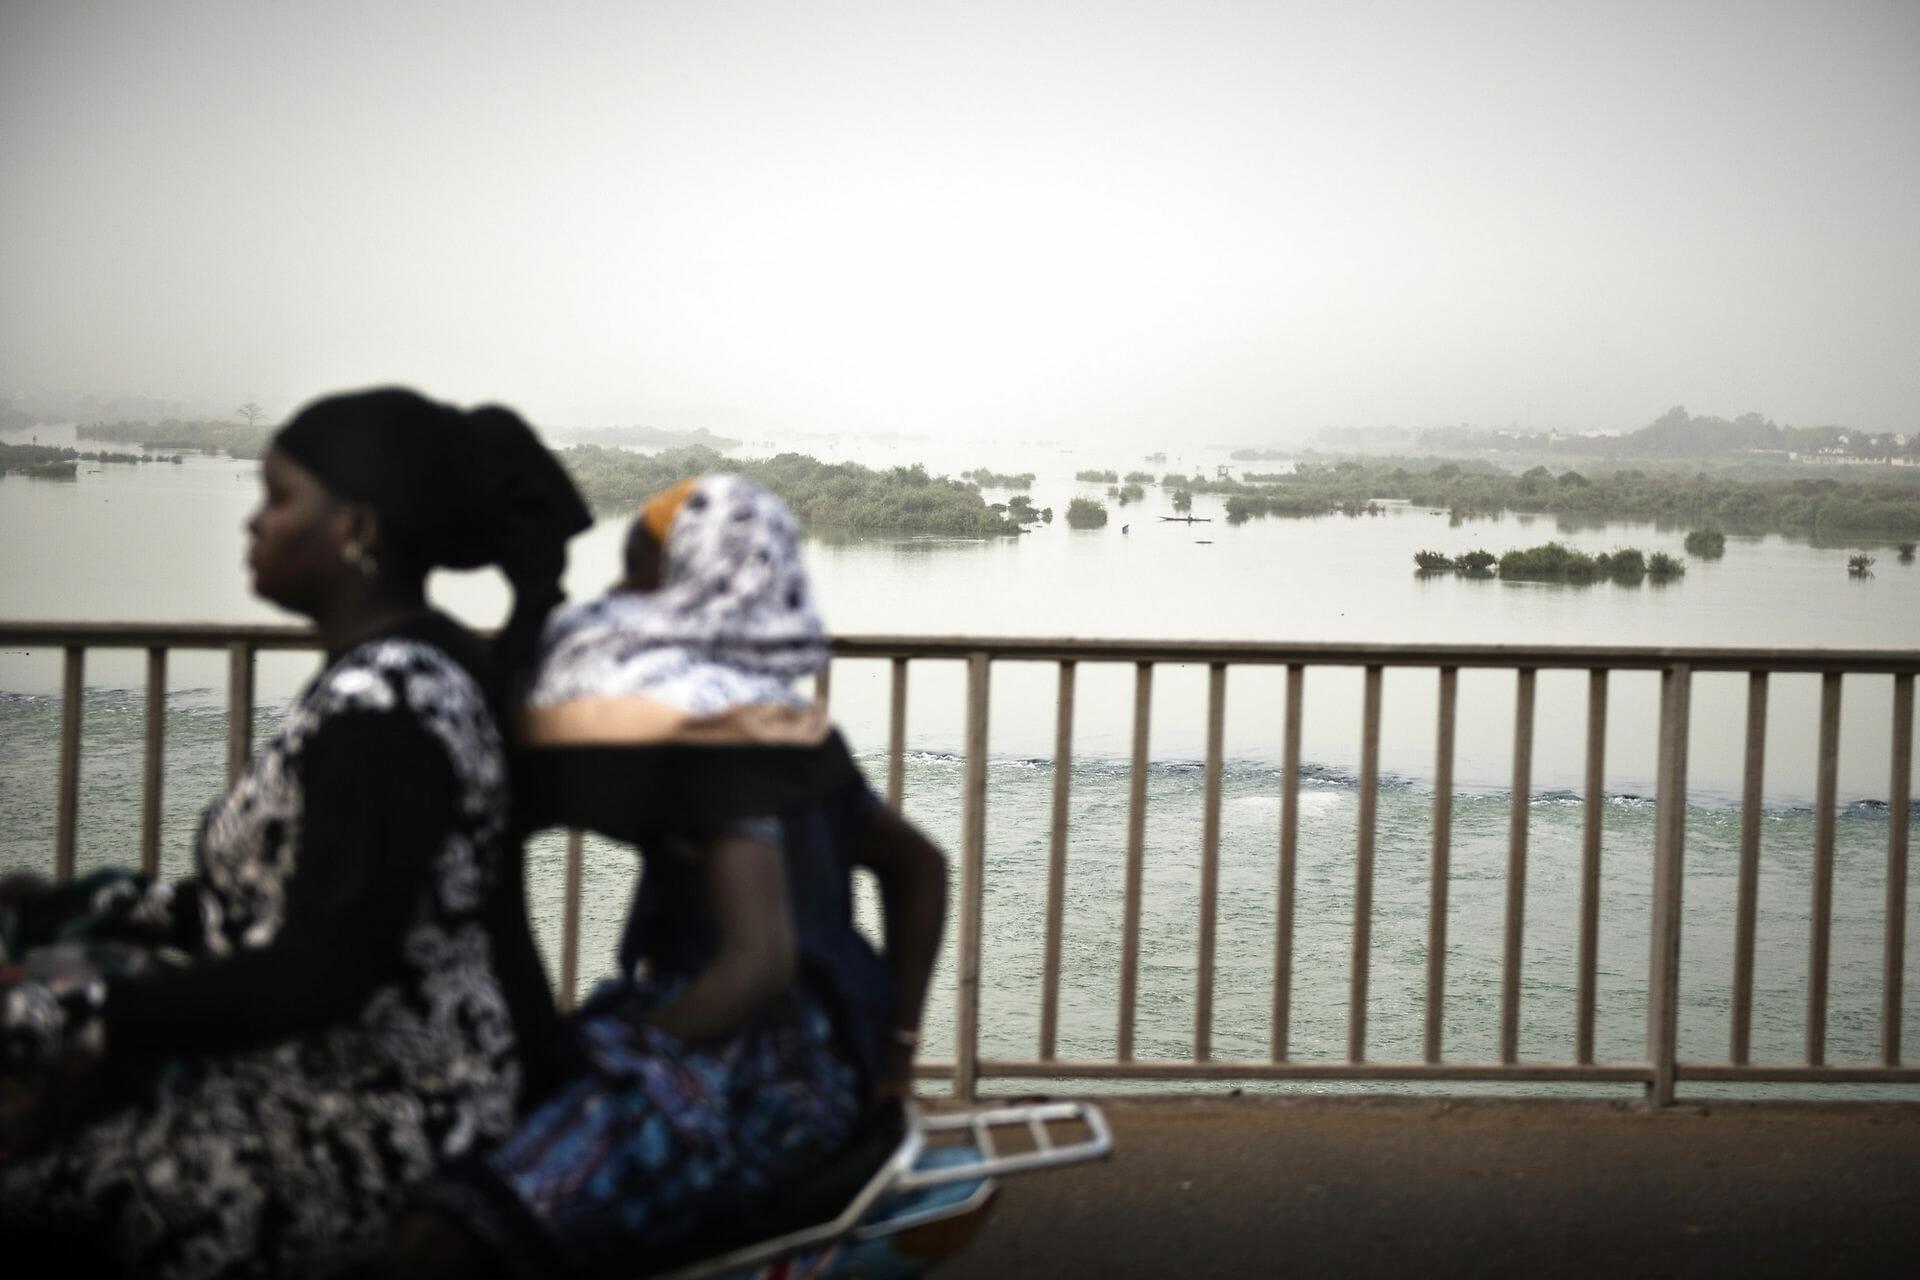 Frygt for stigning i barnebrude efter corona